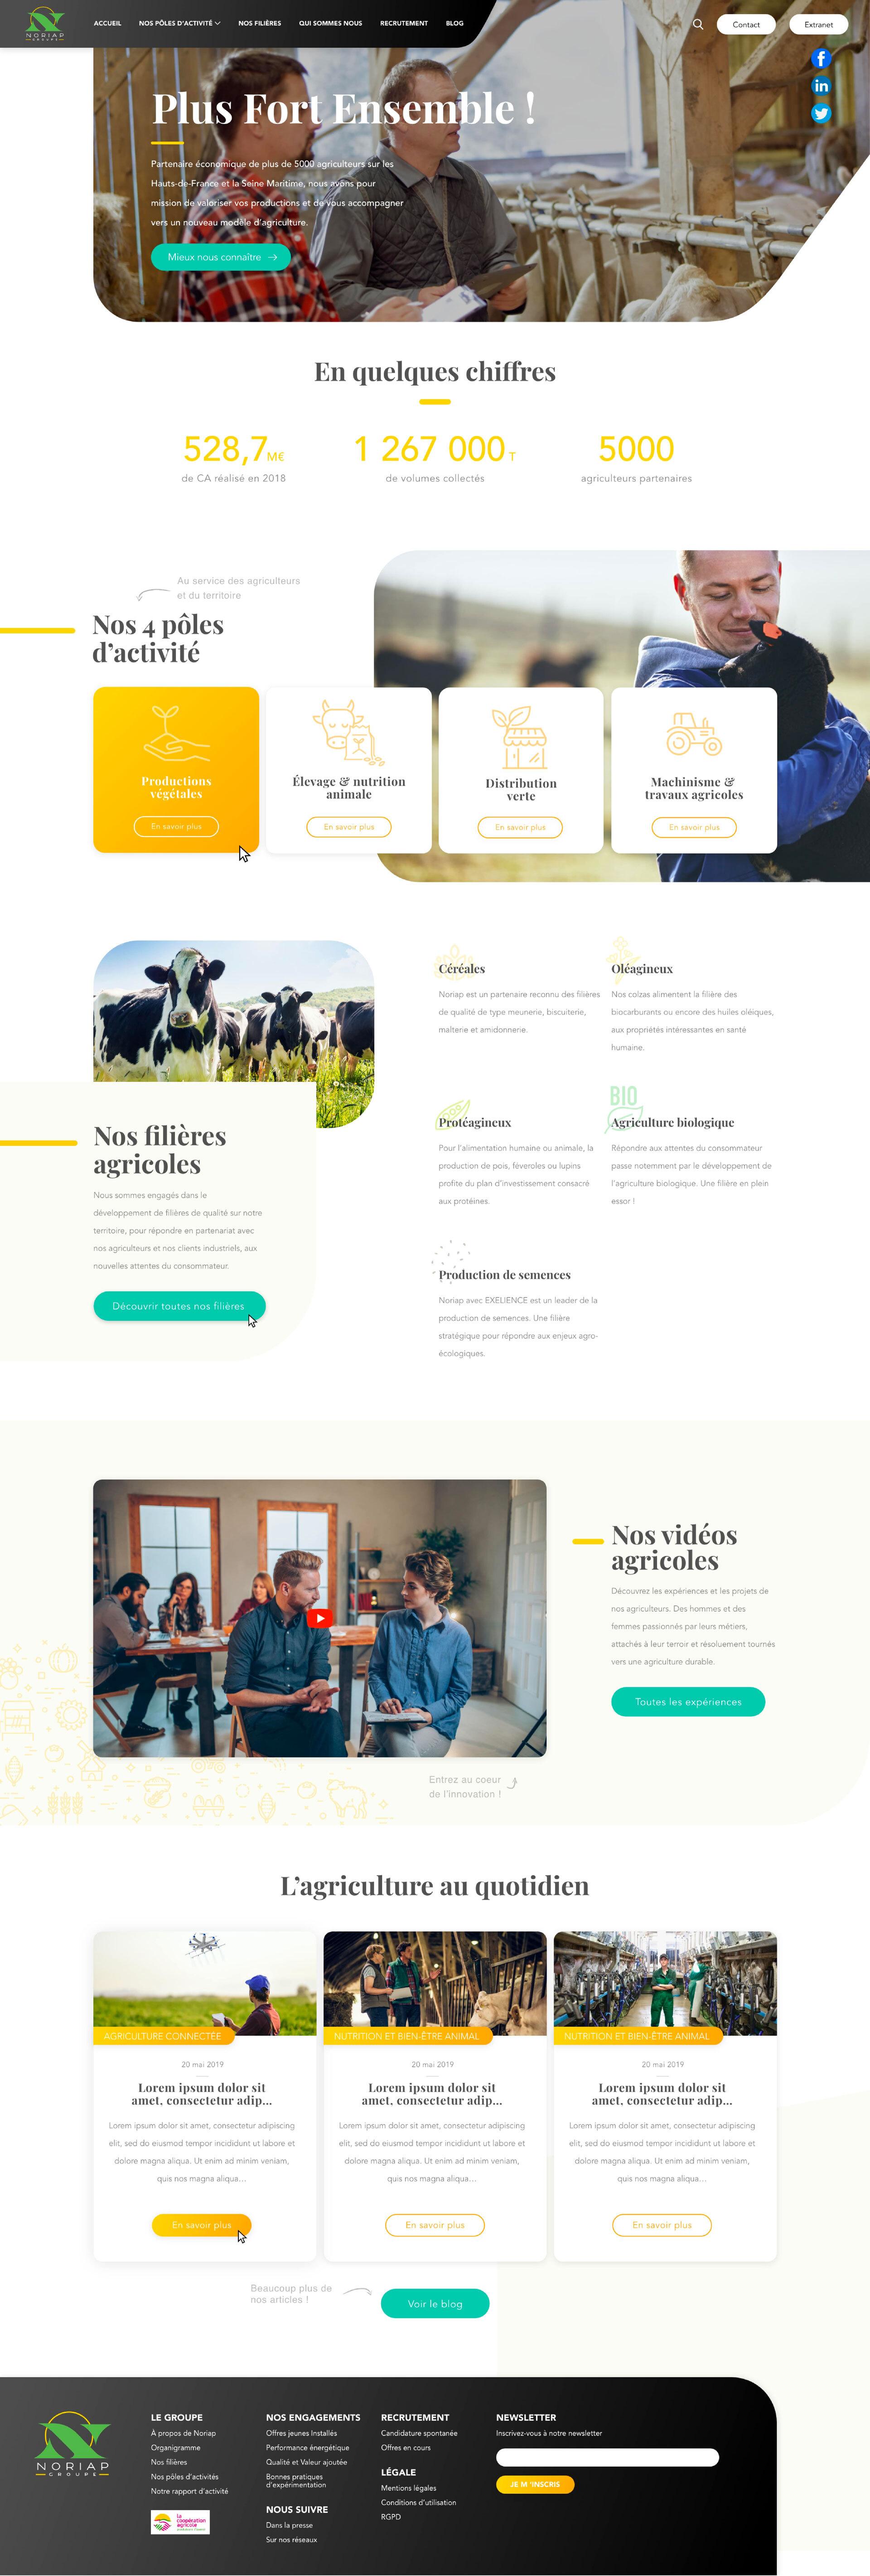 Markentive-Webdesign-Noriap